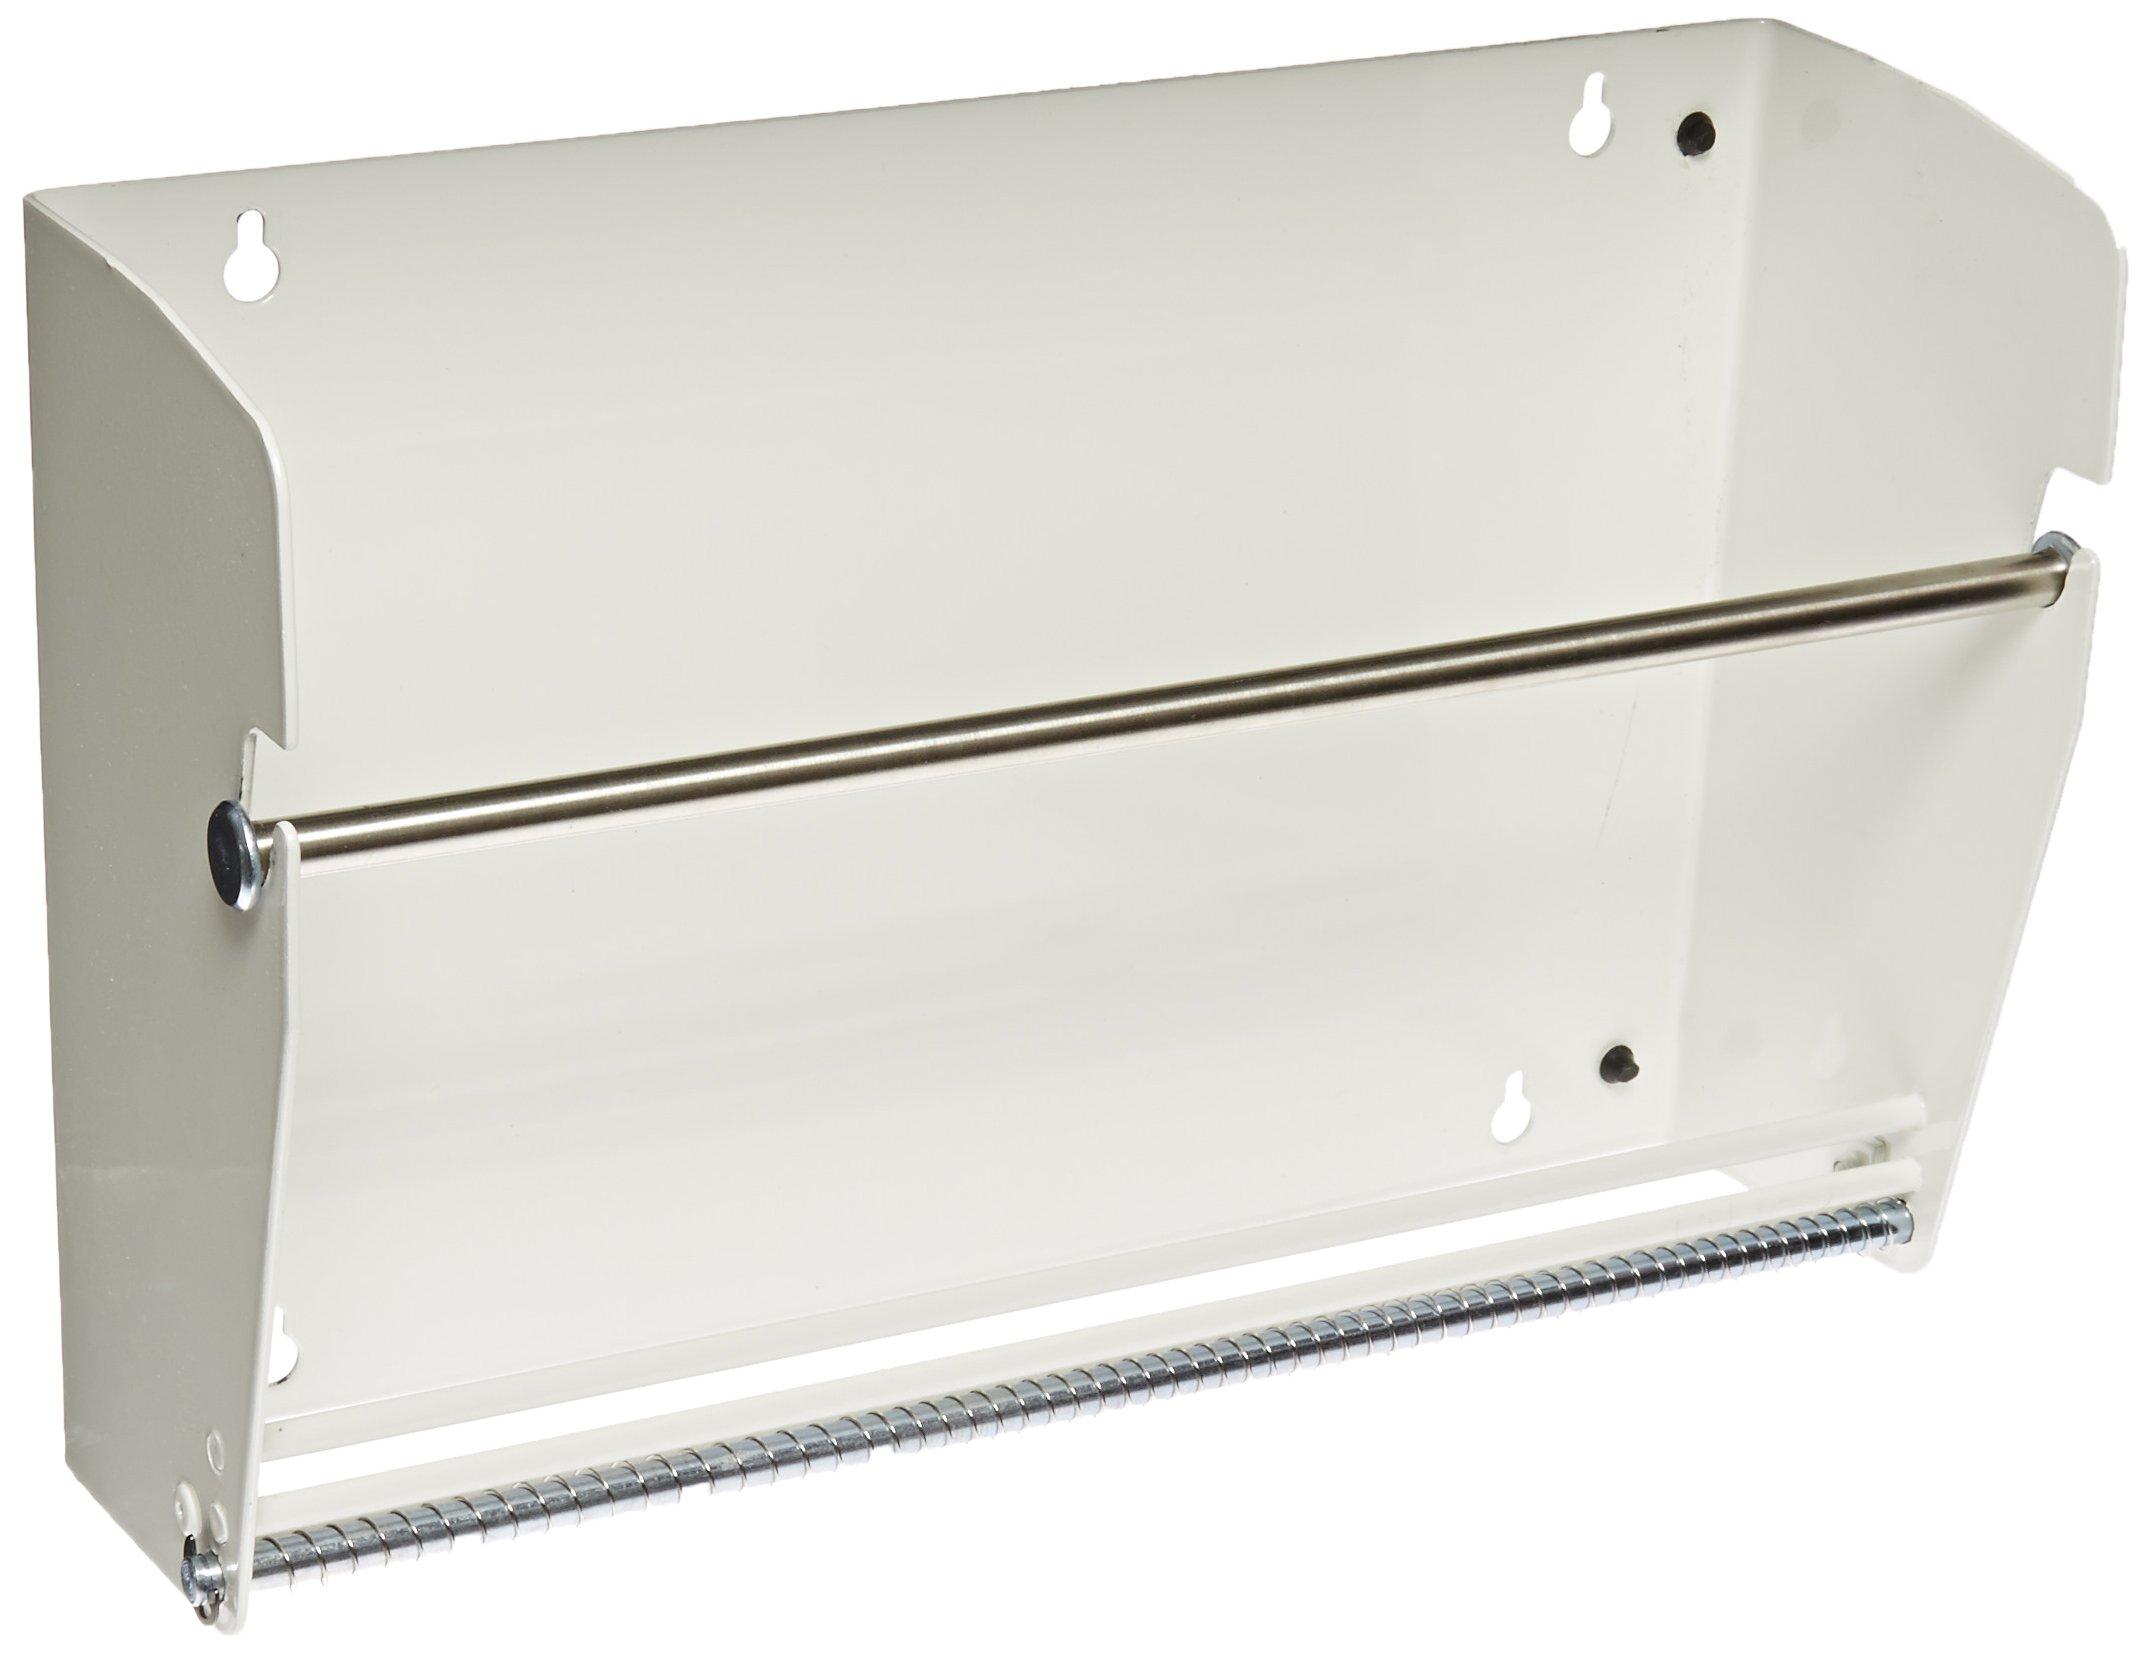 Aviditi LDM1250 Metal Wall Mount Label Dispenser, 12-1/2'' Width, Off White